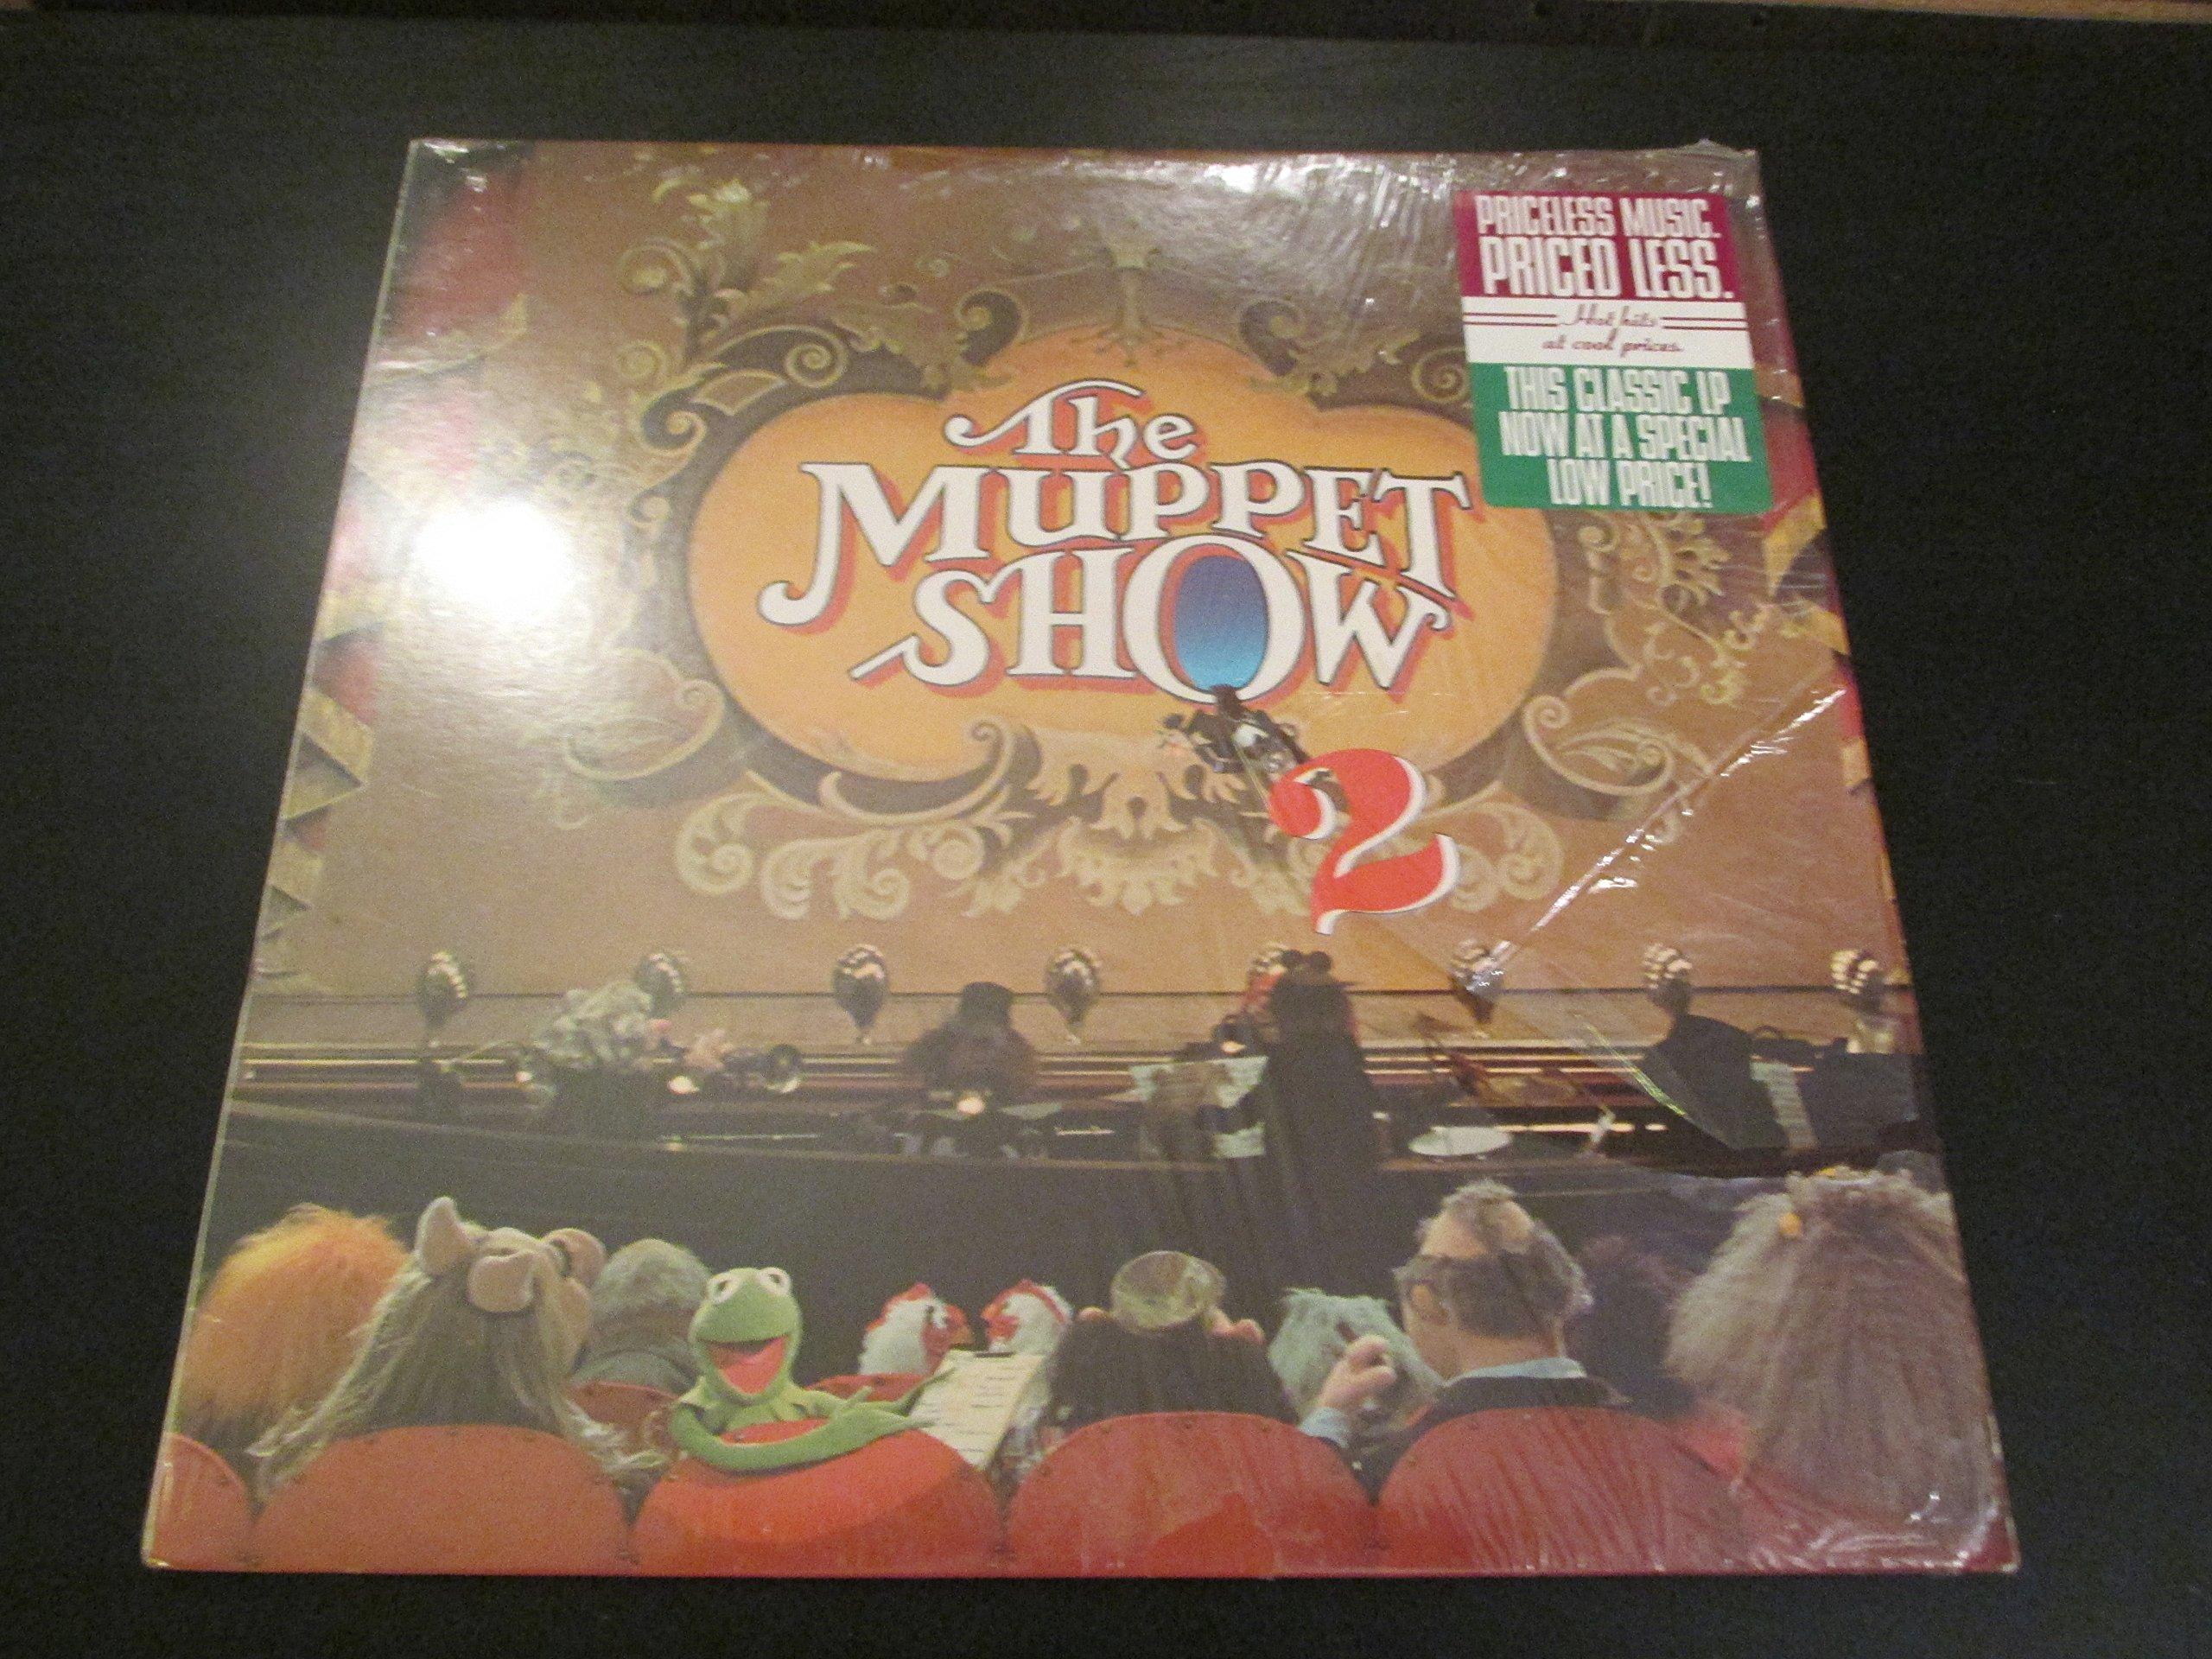 The Muppet Show 2 Original Soundtrack